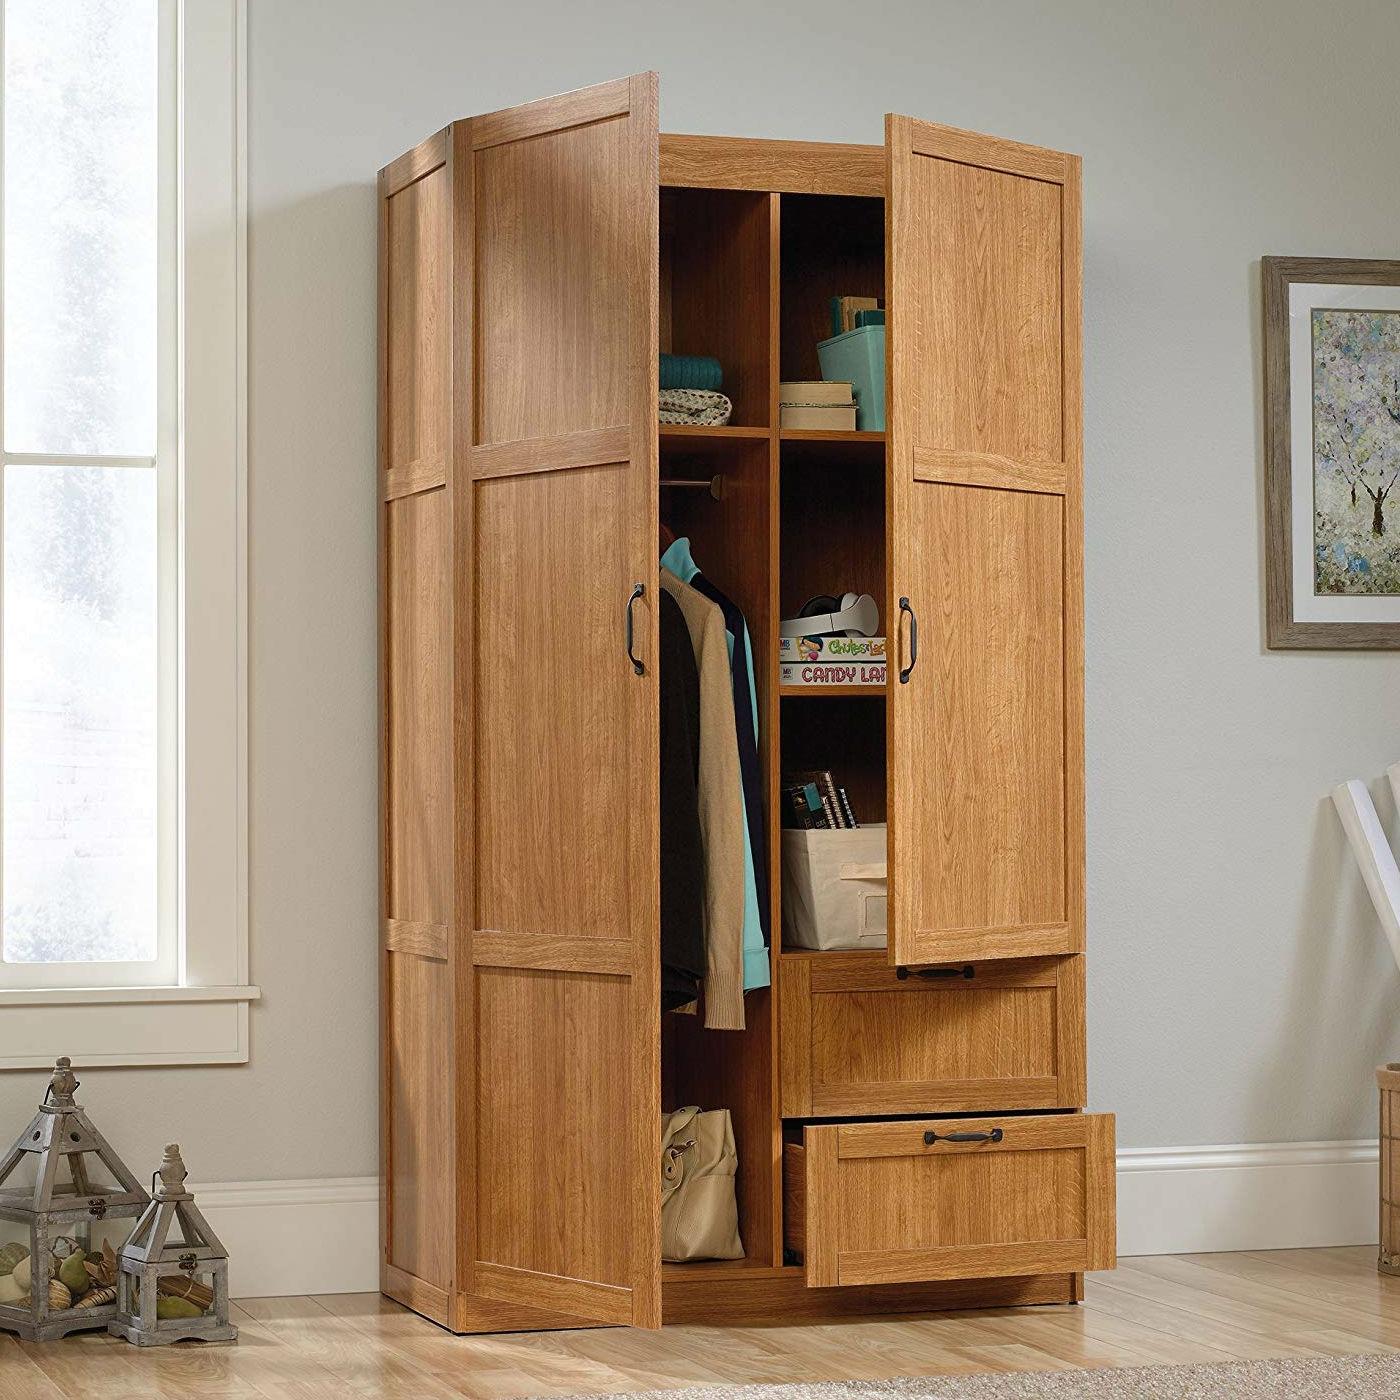 Best Kitchen Gallery: Bedroom Wardrobe Cabi Storage Closet Organizer In Medium Oak of Bedroom Wardrobe Cabinet on rachelxblog.com